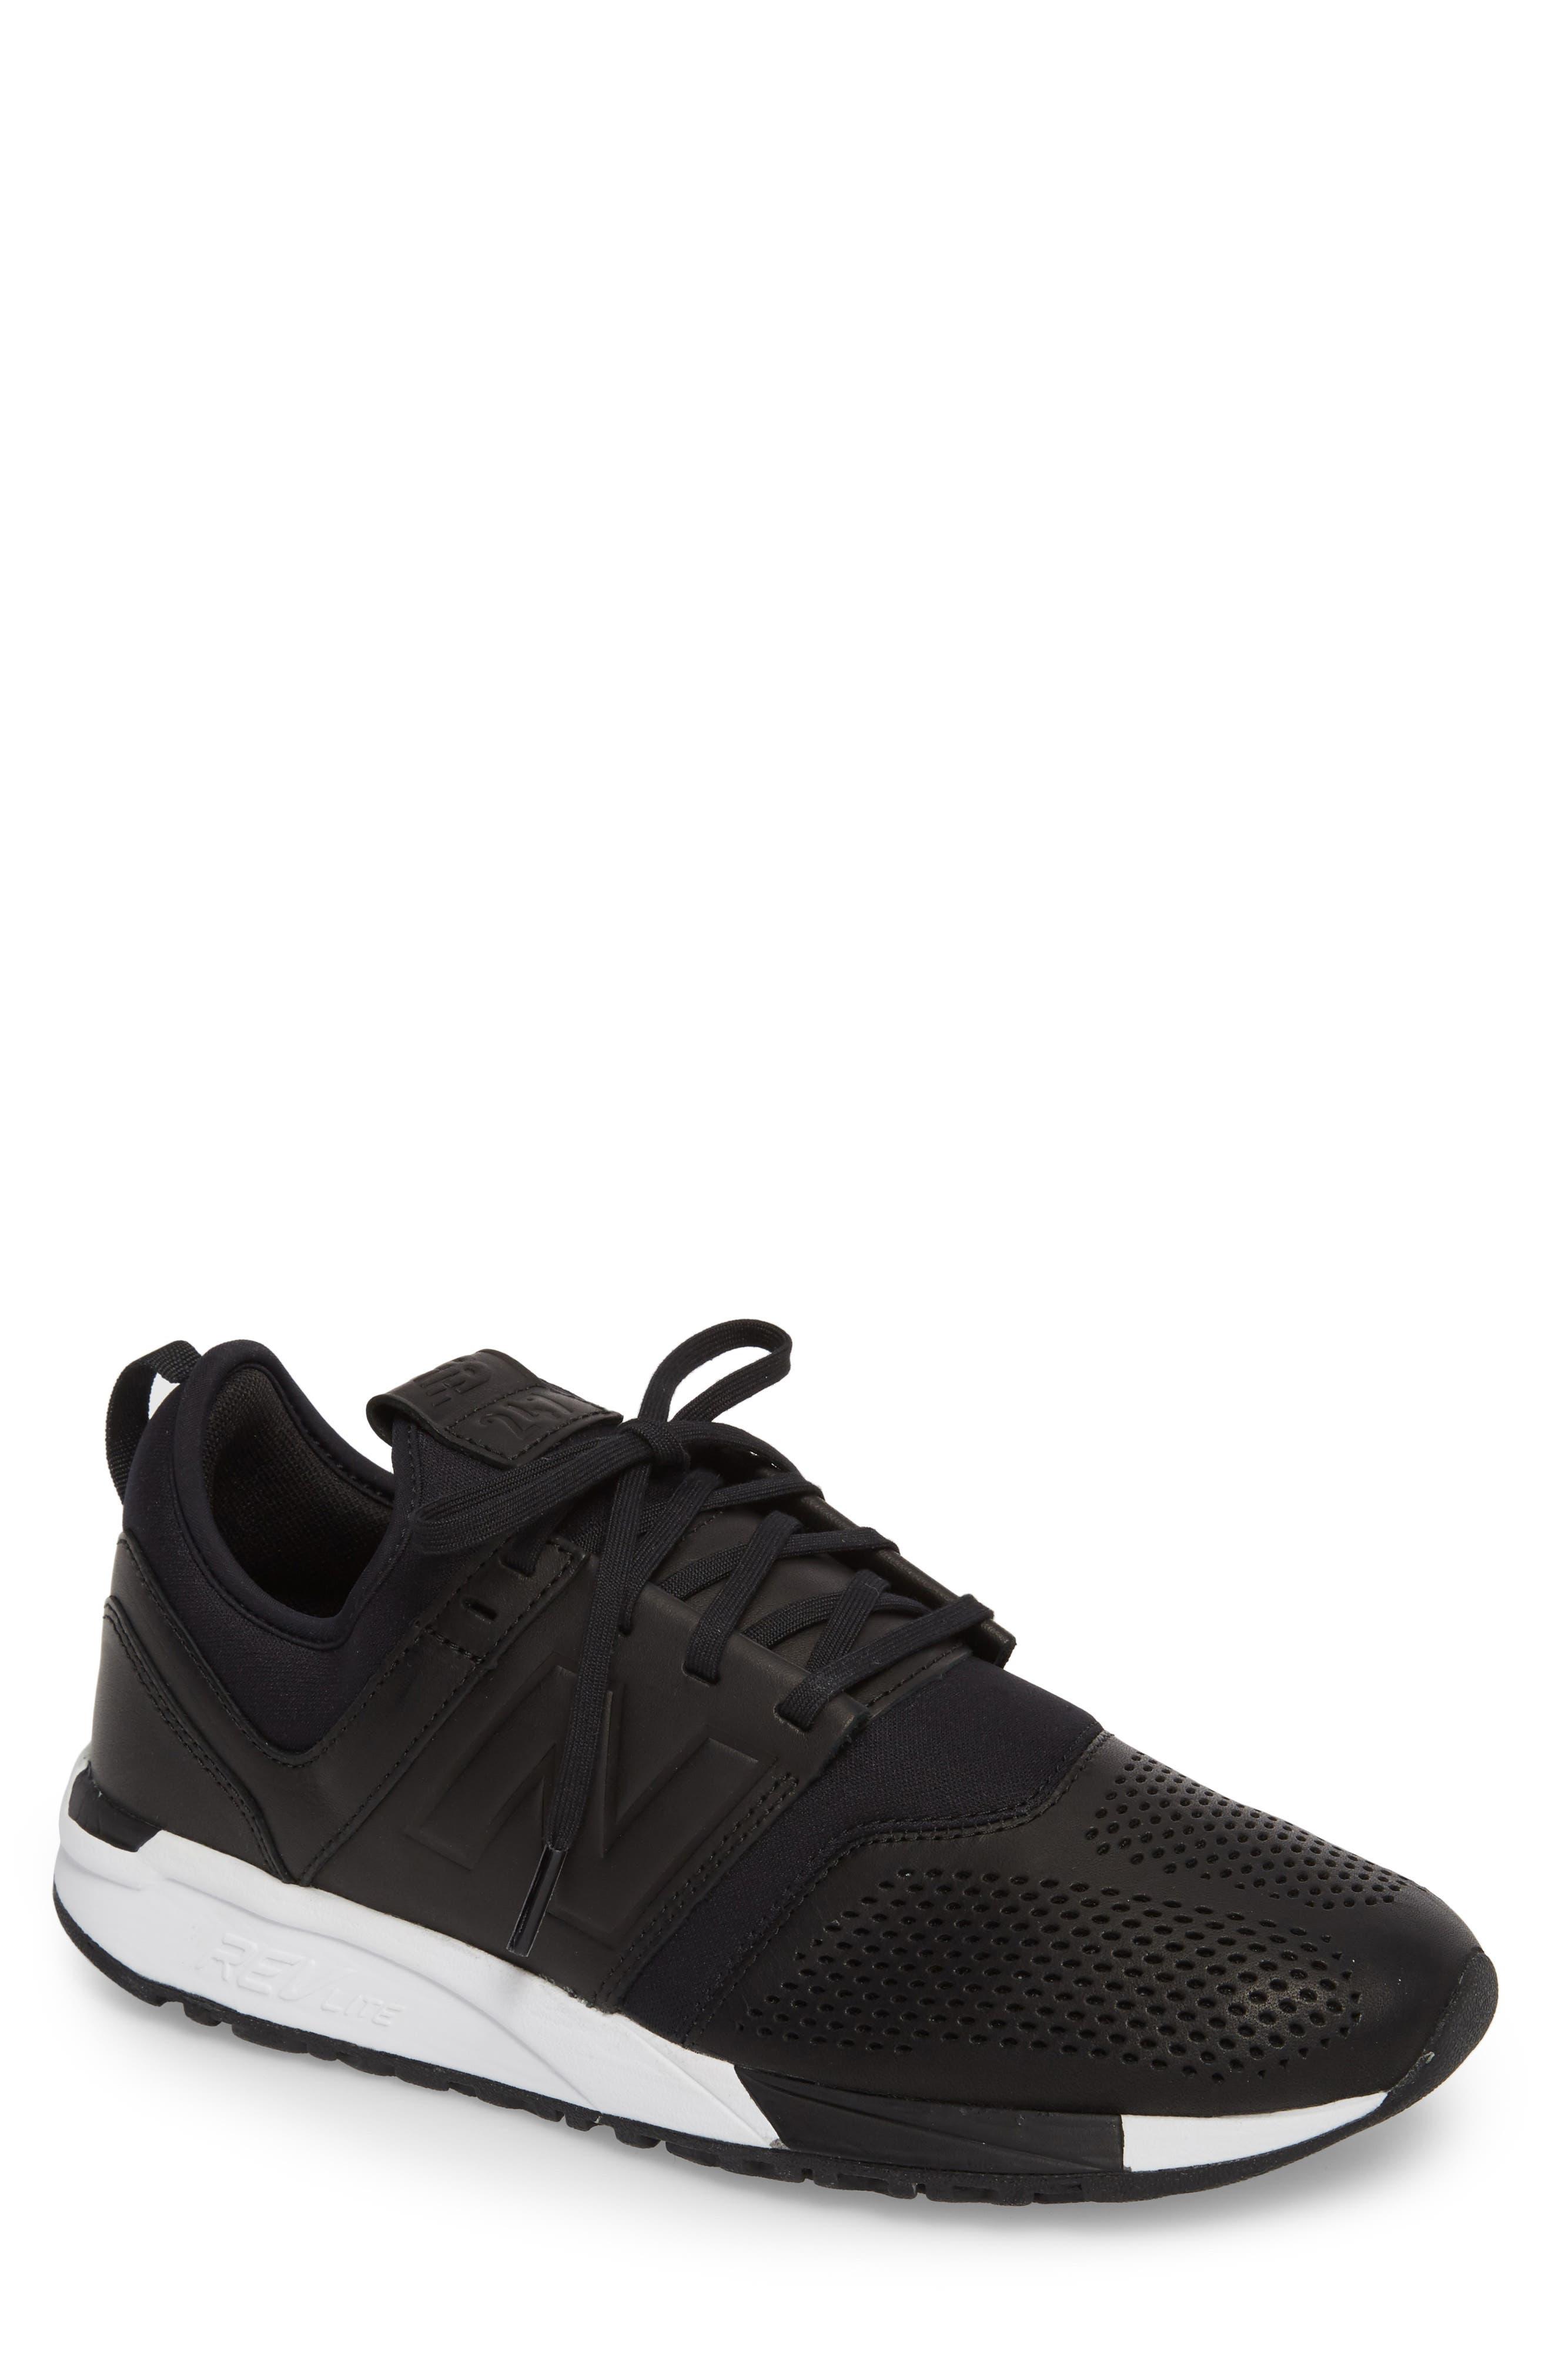 Main Image - New Balance MRL247 Sneaker (Men)